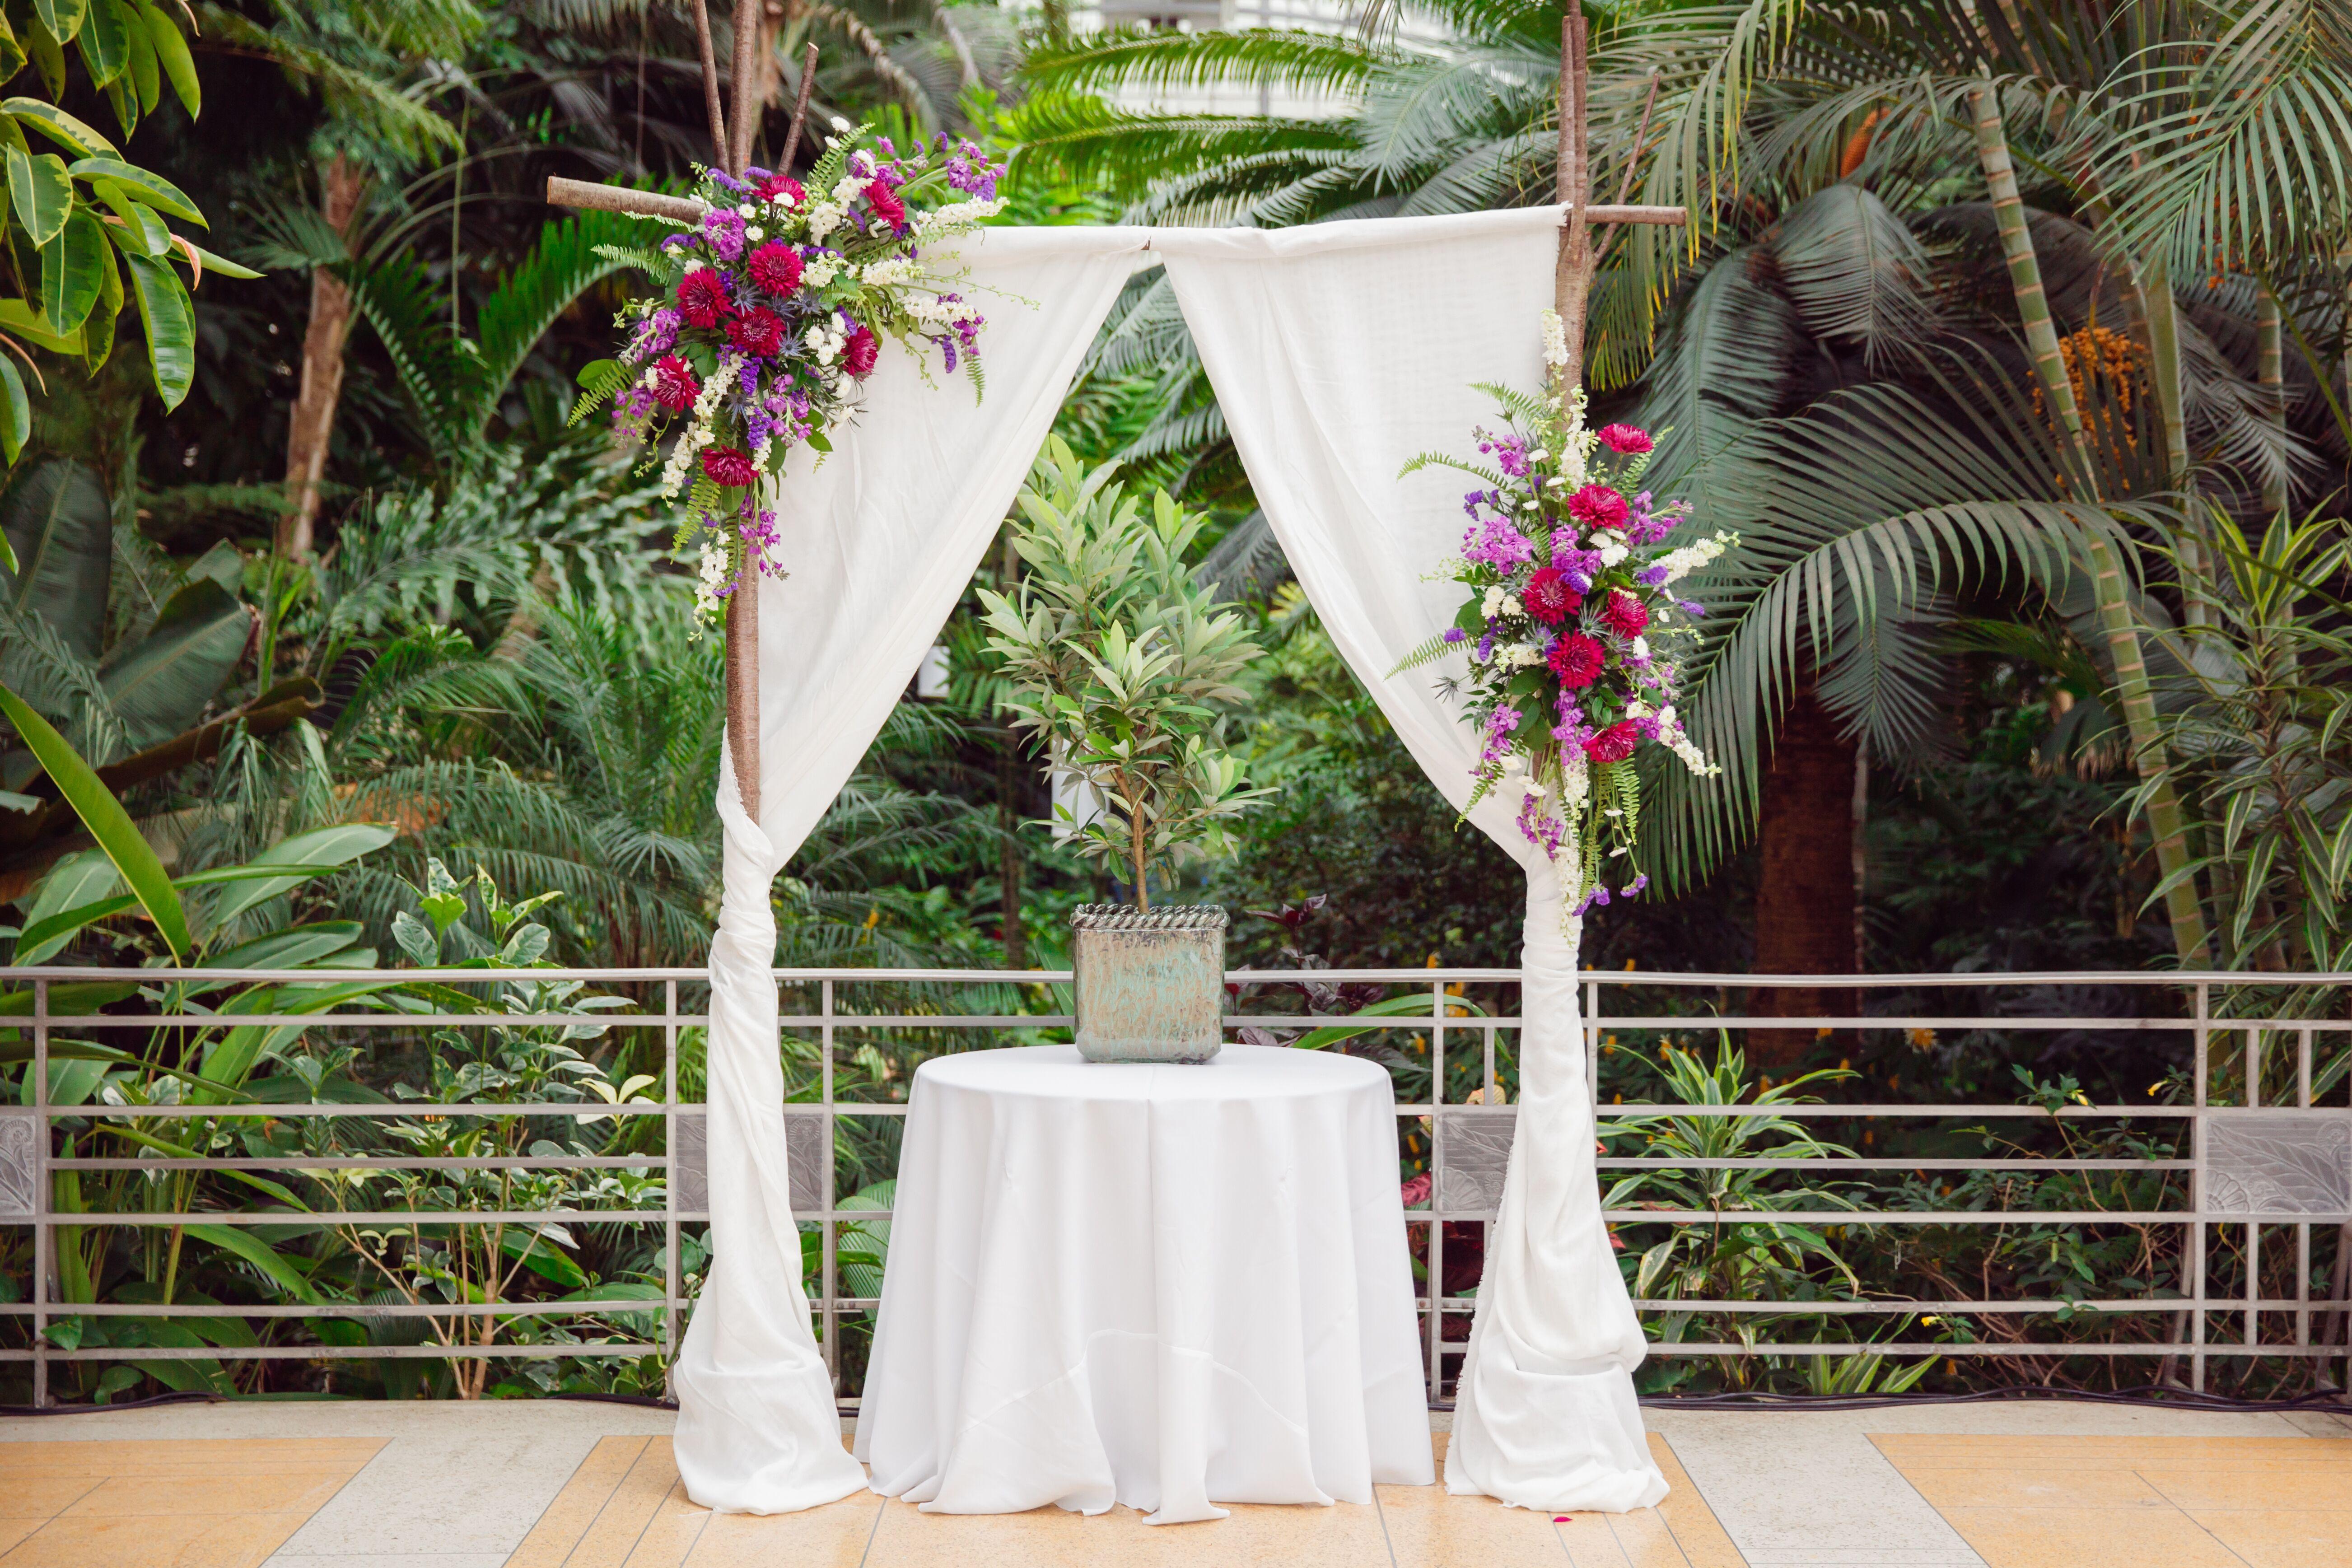 Wedding Ceremony Ideas Flower Covered Wedding Arch: Draped Wedding Arch, Flower Arrangements